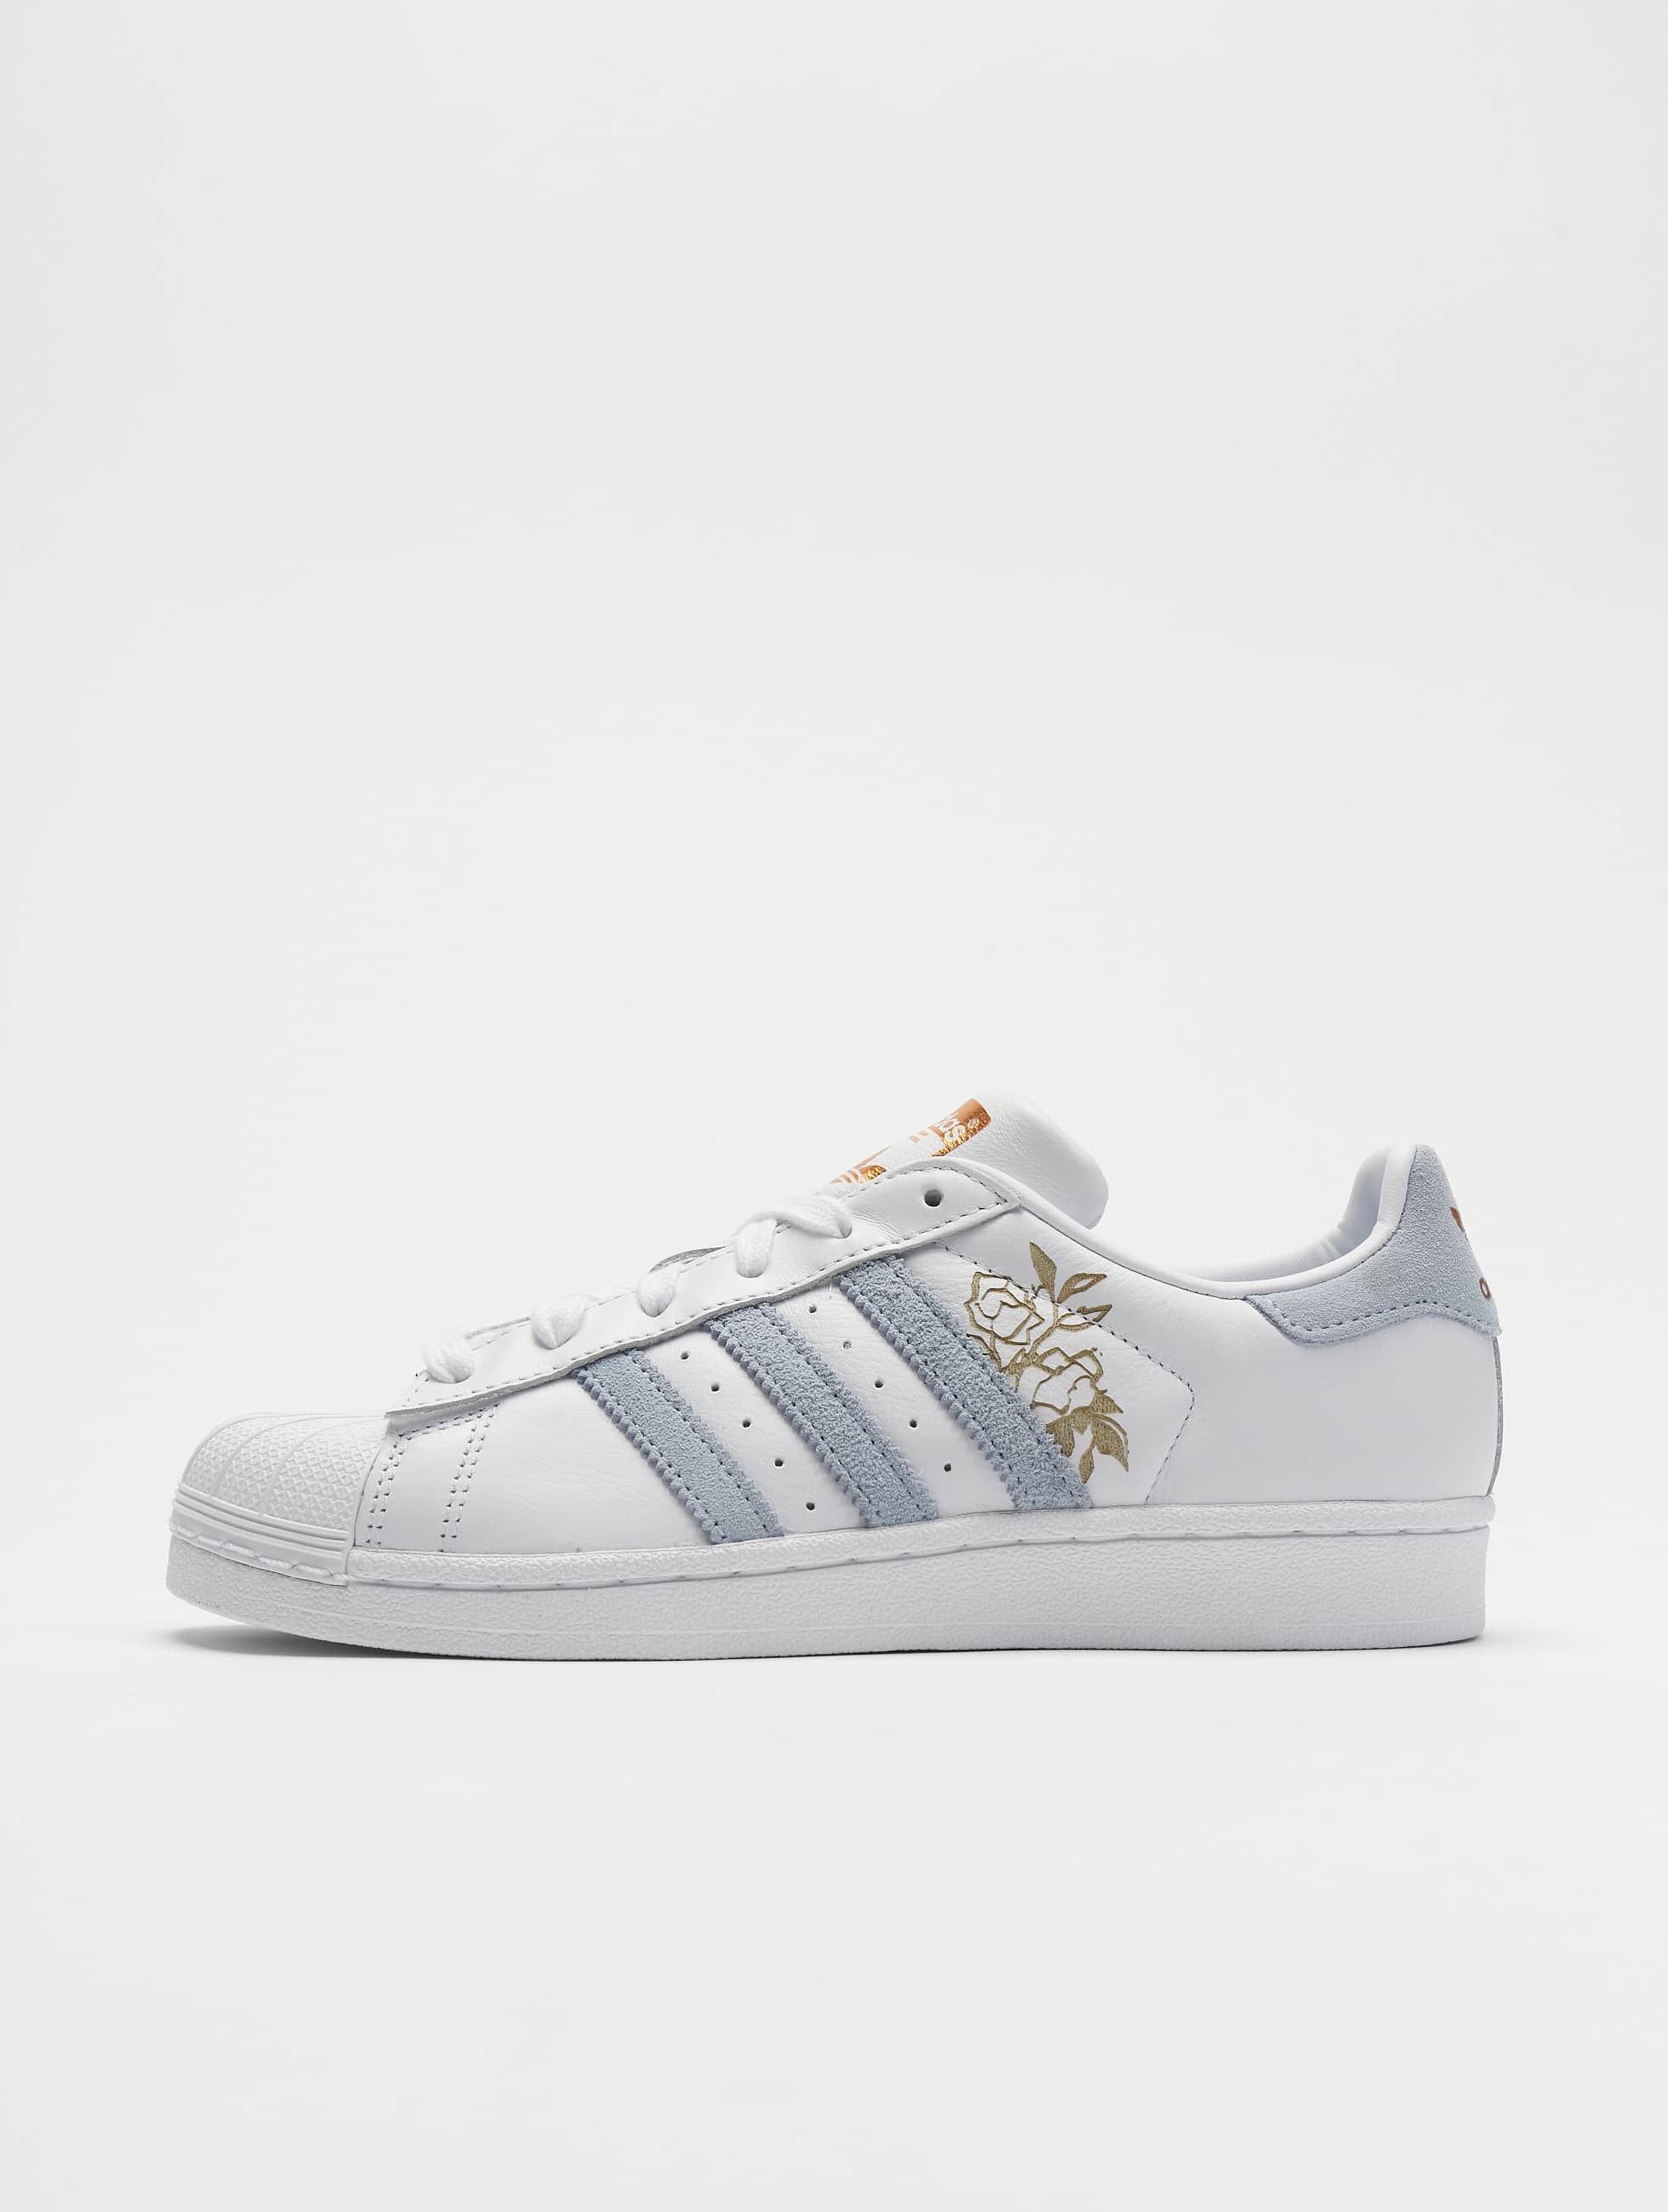 Adidas Originals Superstar Sneakers Ftwr WhitePeriwinkleCopper Met